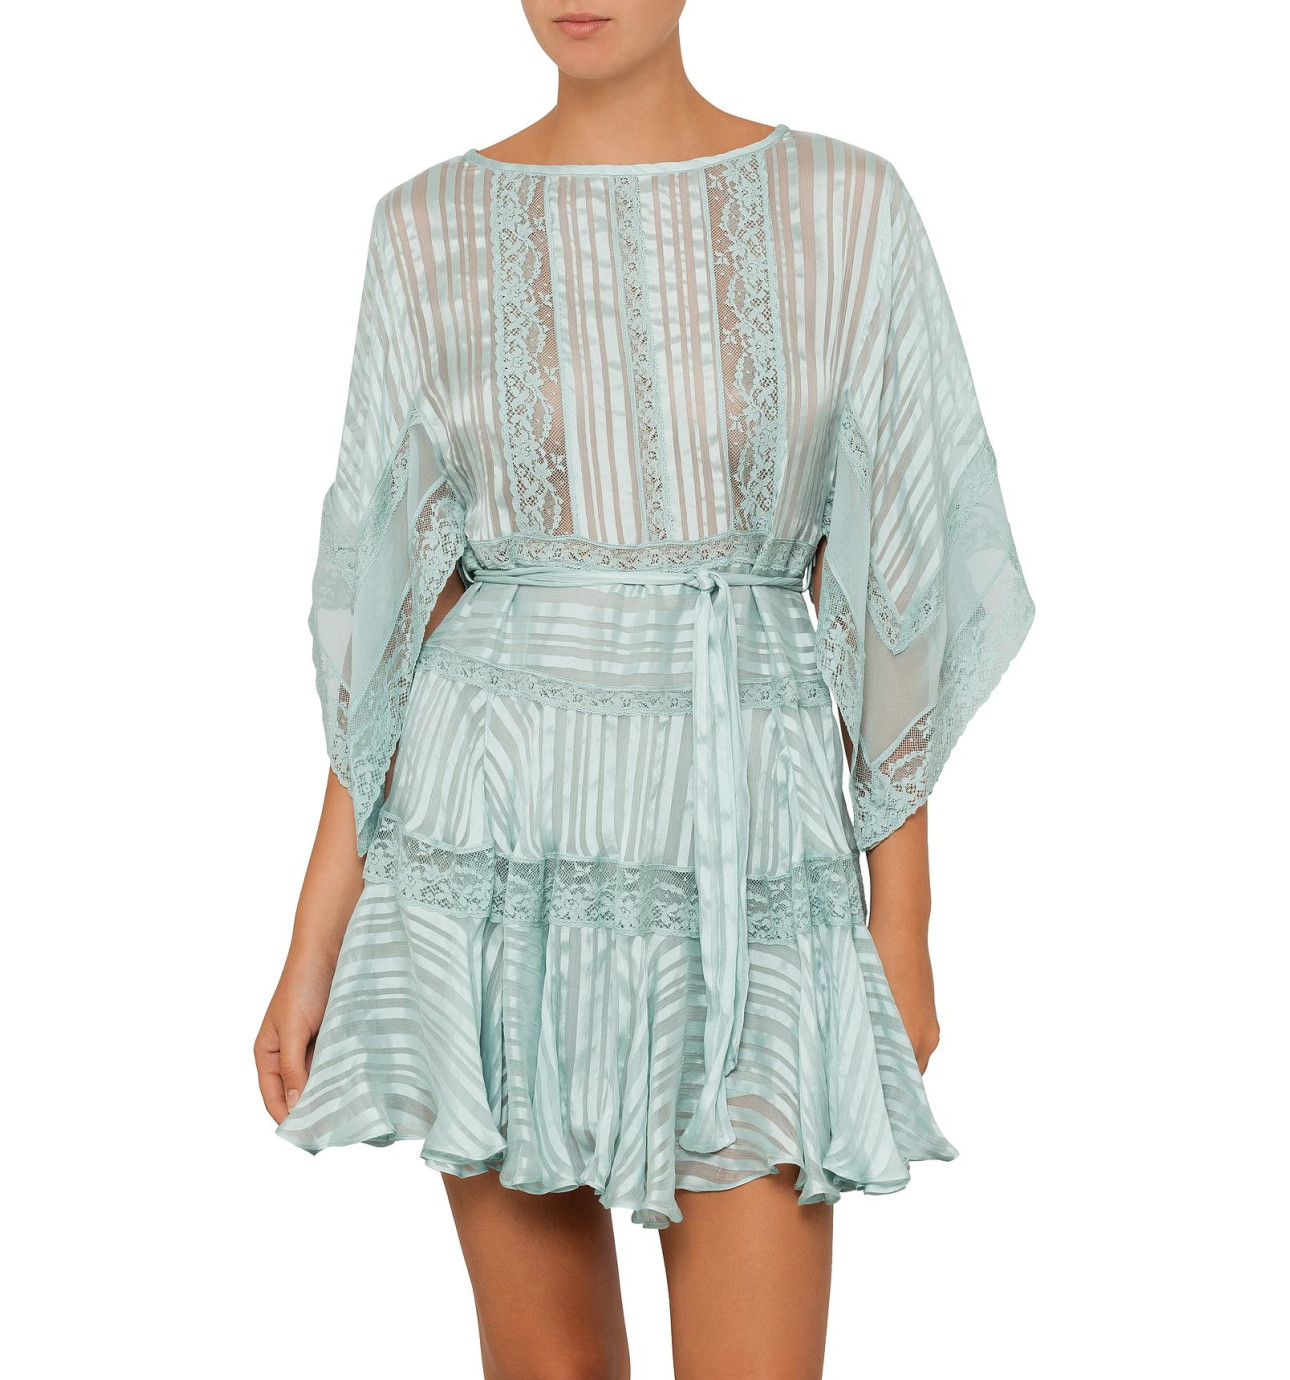 Dresses, Dresses Online, Dresses Australia | David Jones